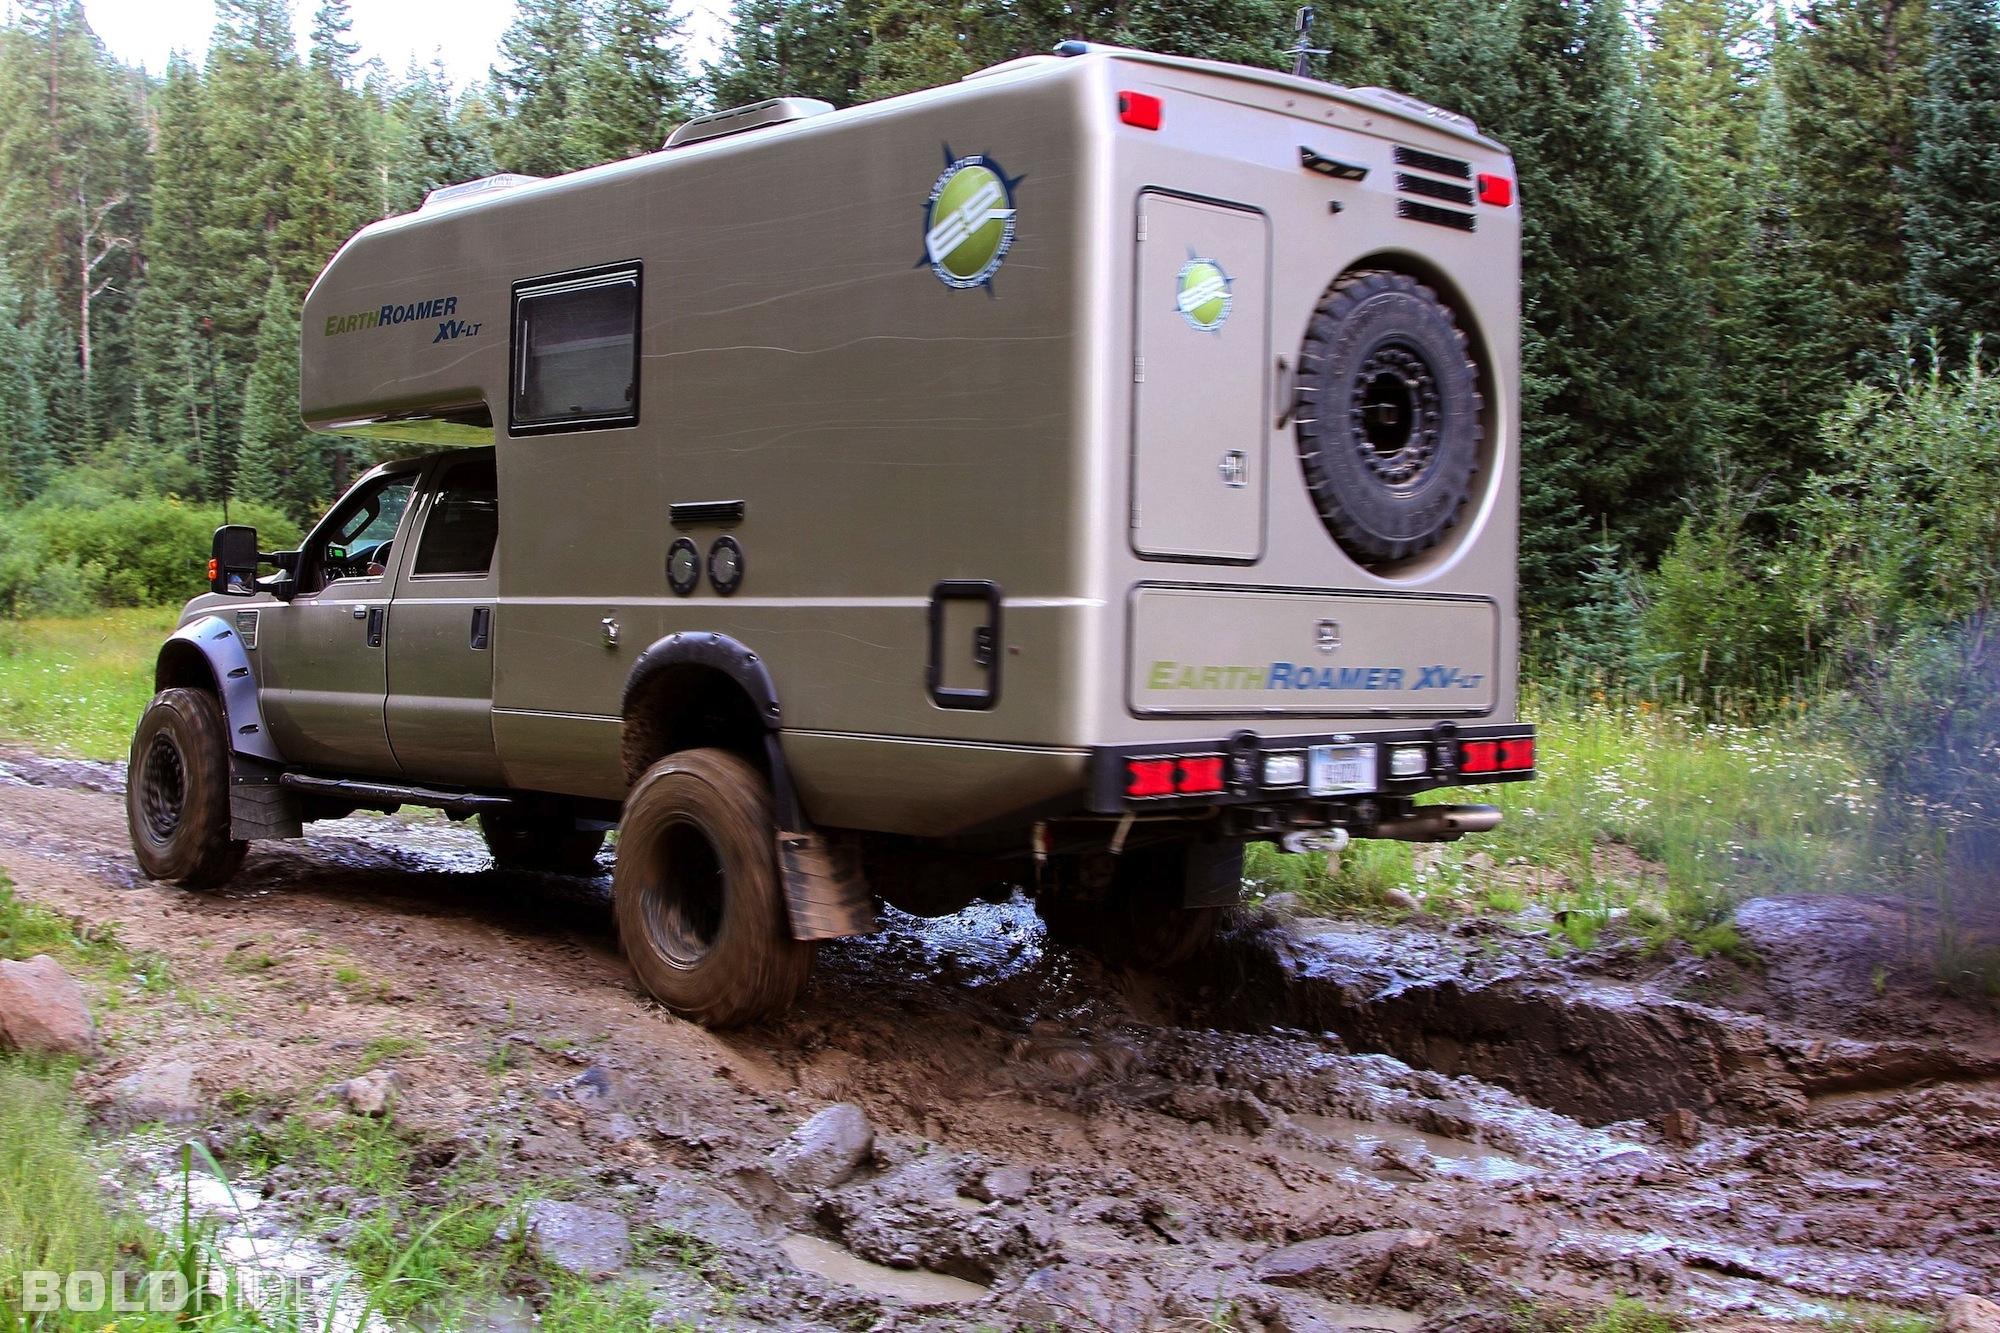 2013 ford f 550 xv lt 4x4 offroad truck camper fs. Black Bedroom Furniture Sets. Home Design Ideas